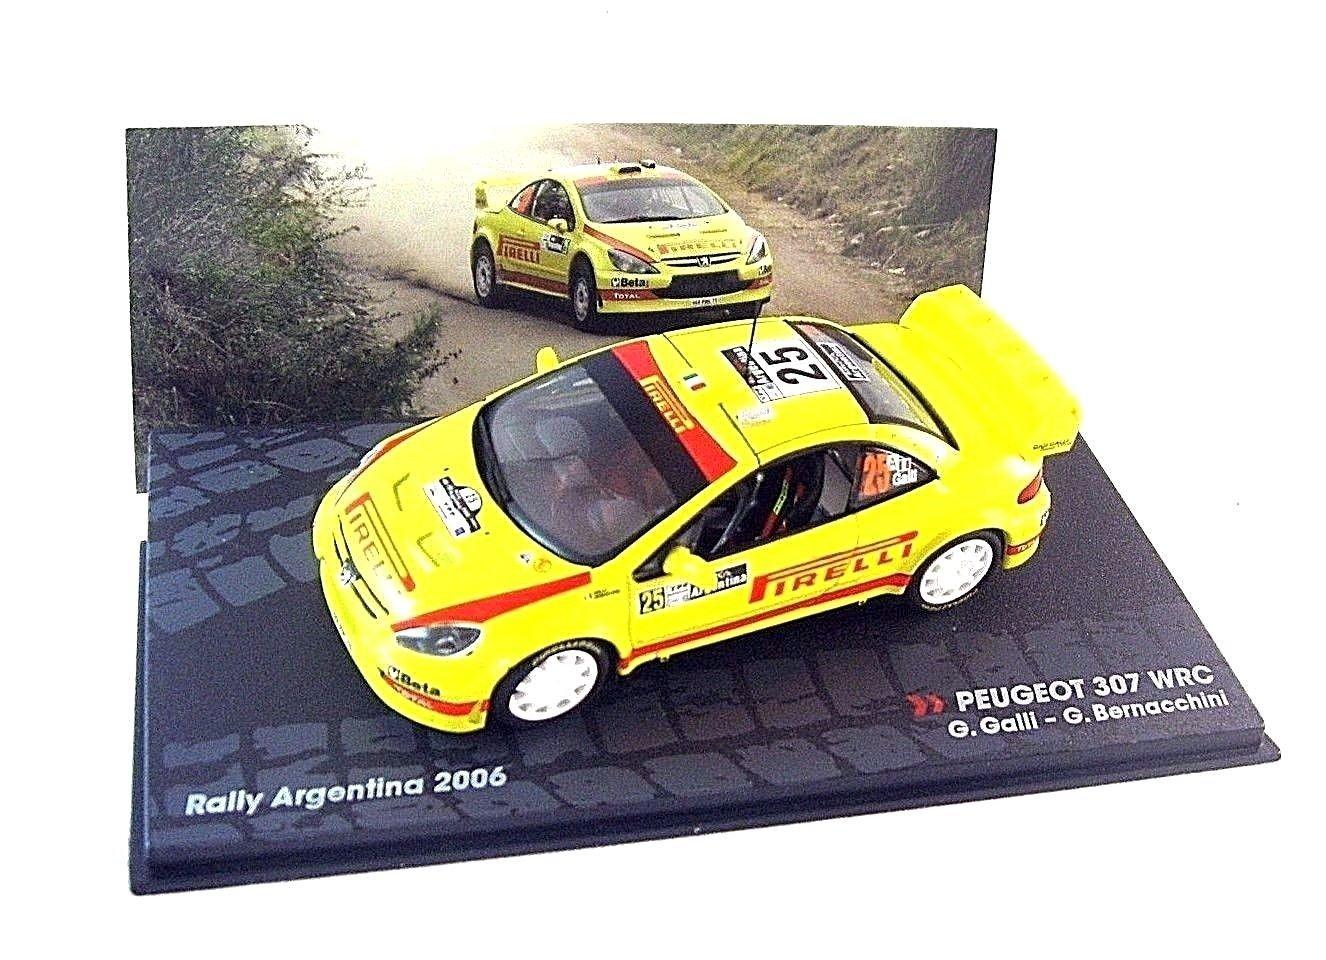 PEUGEOT 307 WRC#25, 2006 YELLOW ALTAYA 1/43 DIECAST CAR COLLECTOR'S MODEL, NEW